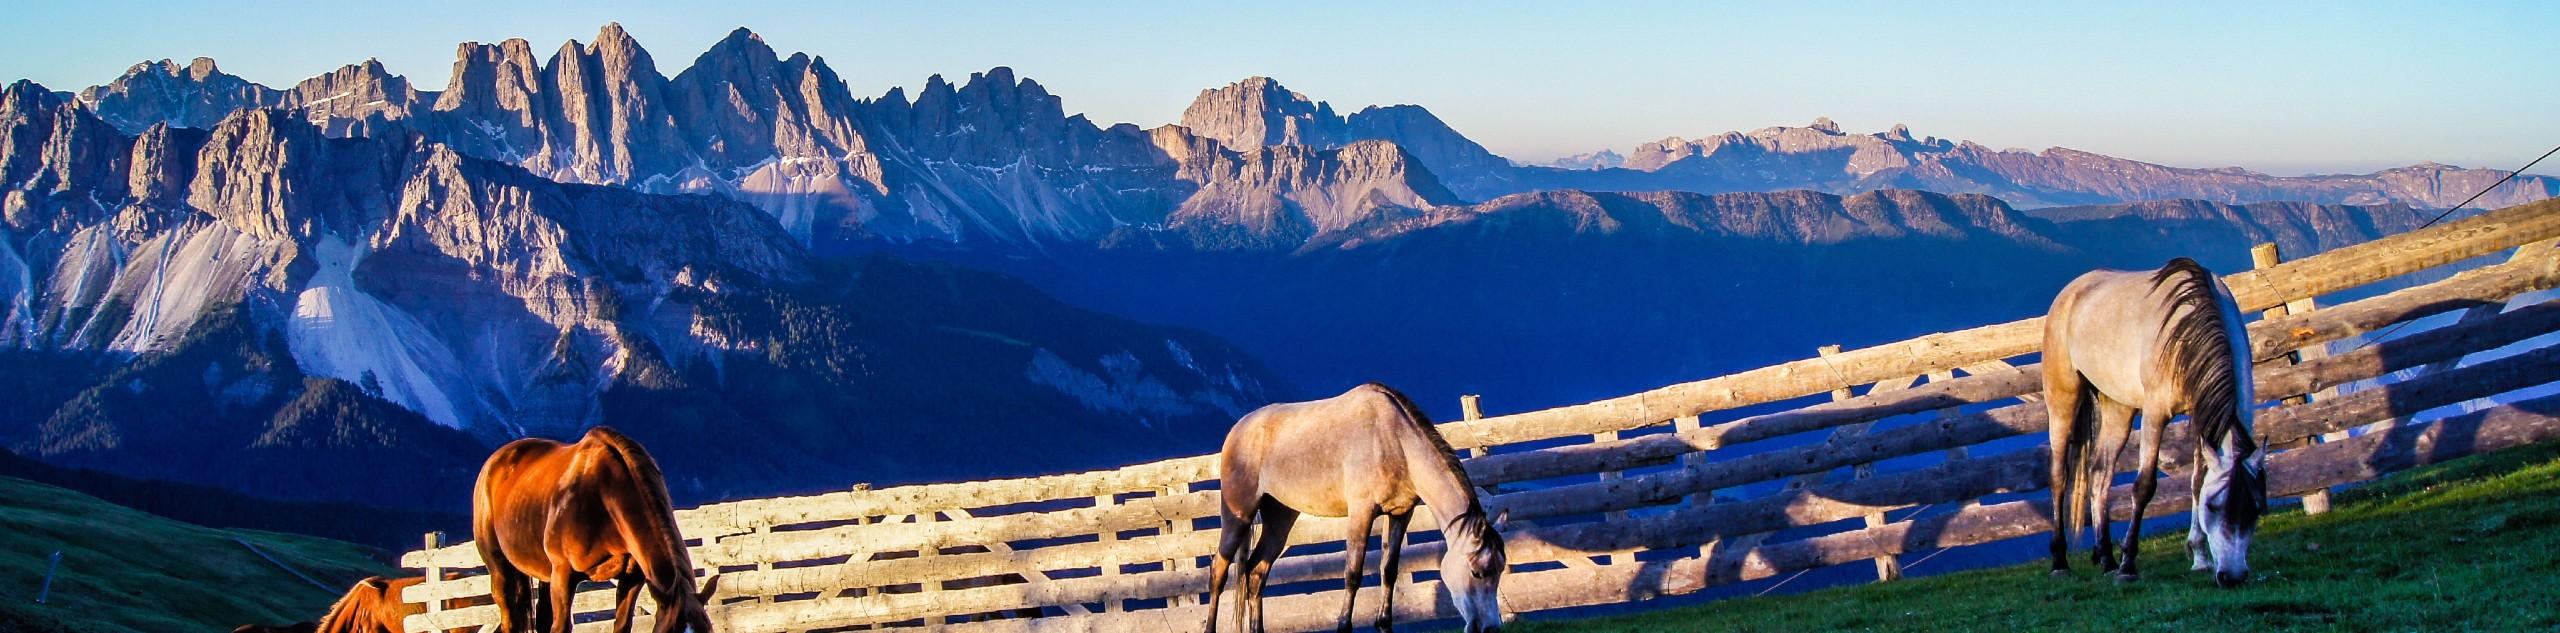 Dolomites Chestnut Route Walking